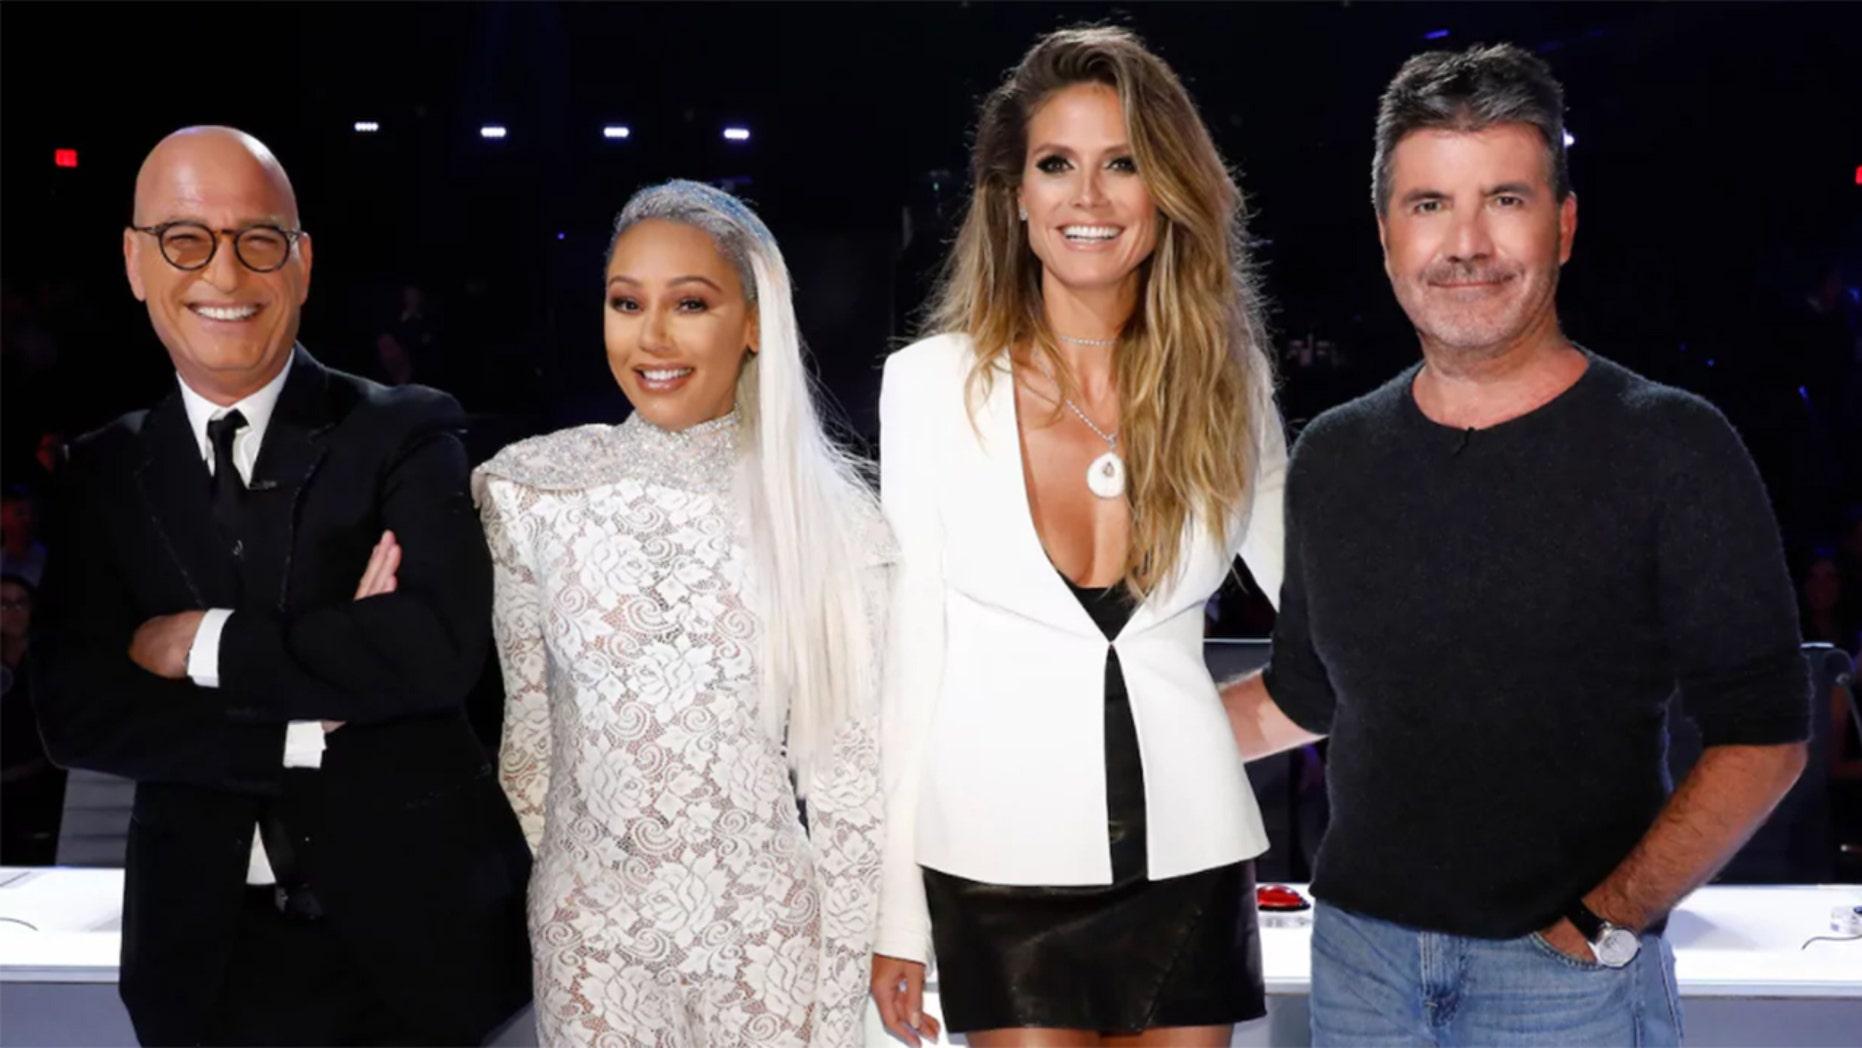 """America's Got Talent"" judges Howie Mandel, Mel B, Heidi Klum and Simon Cowell"